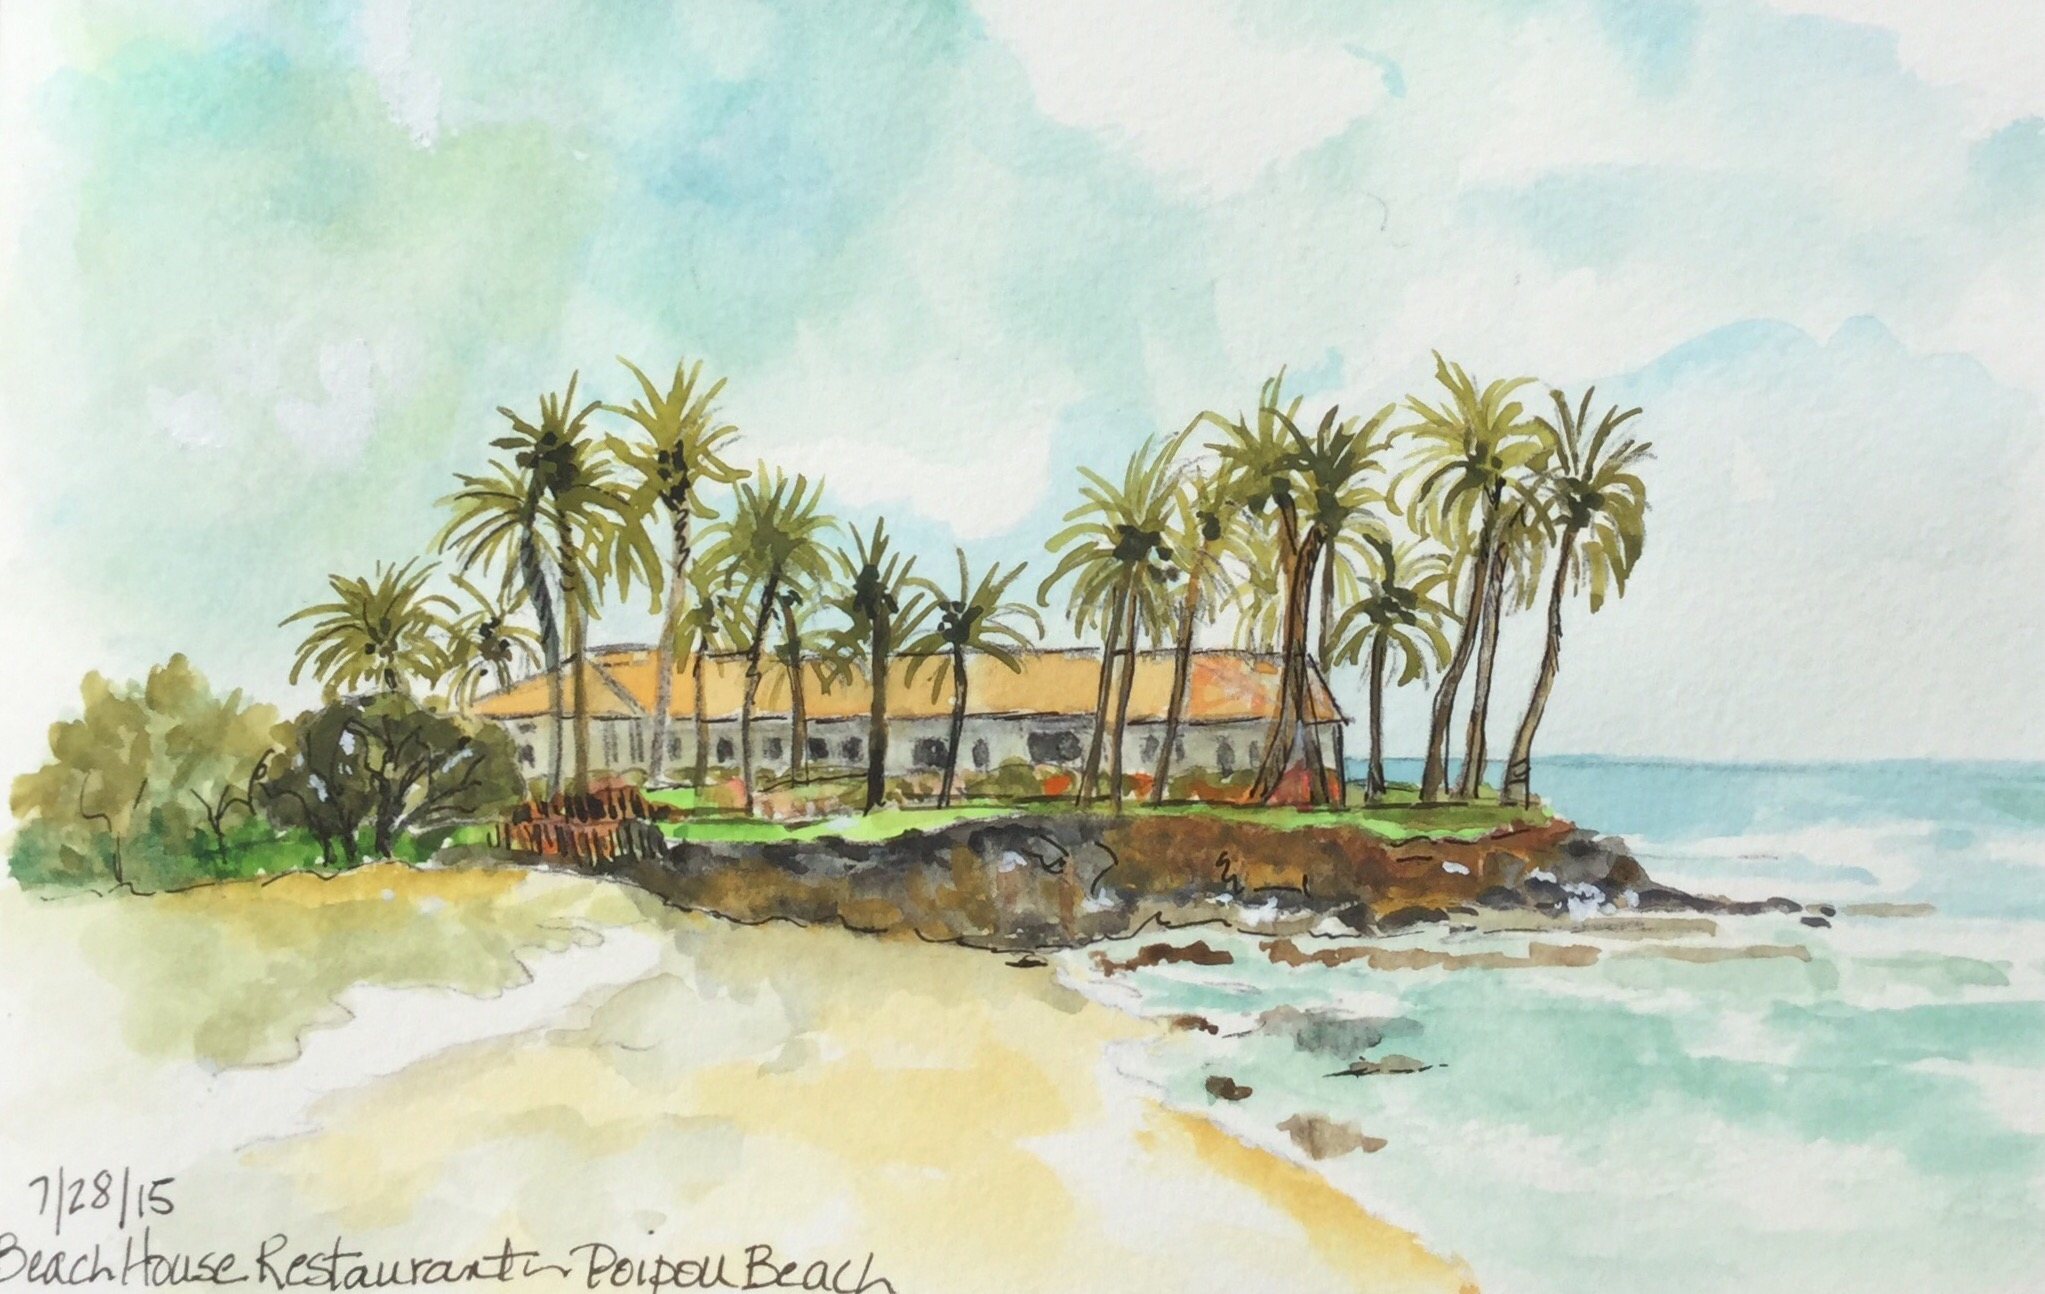 GUEST DOODLEWASH - Beach House Restaurant